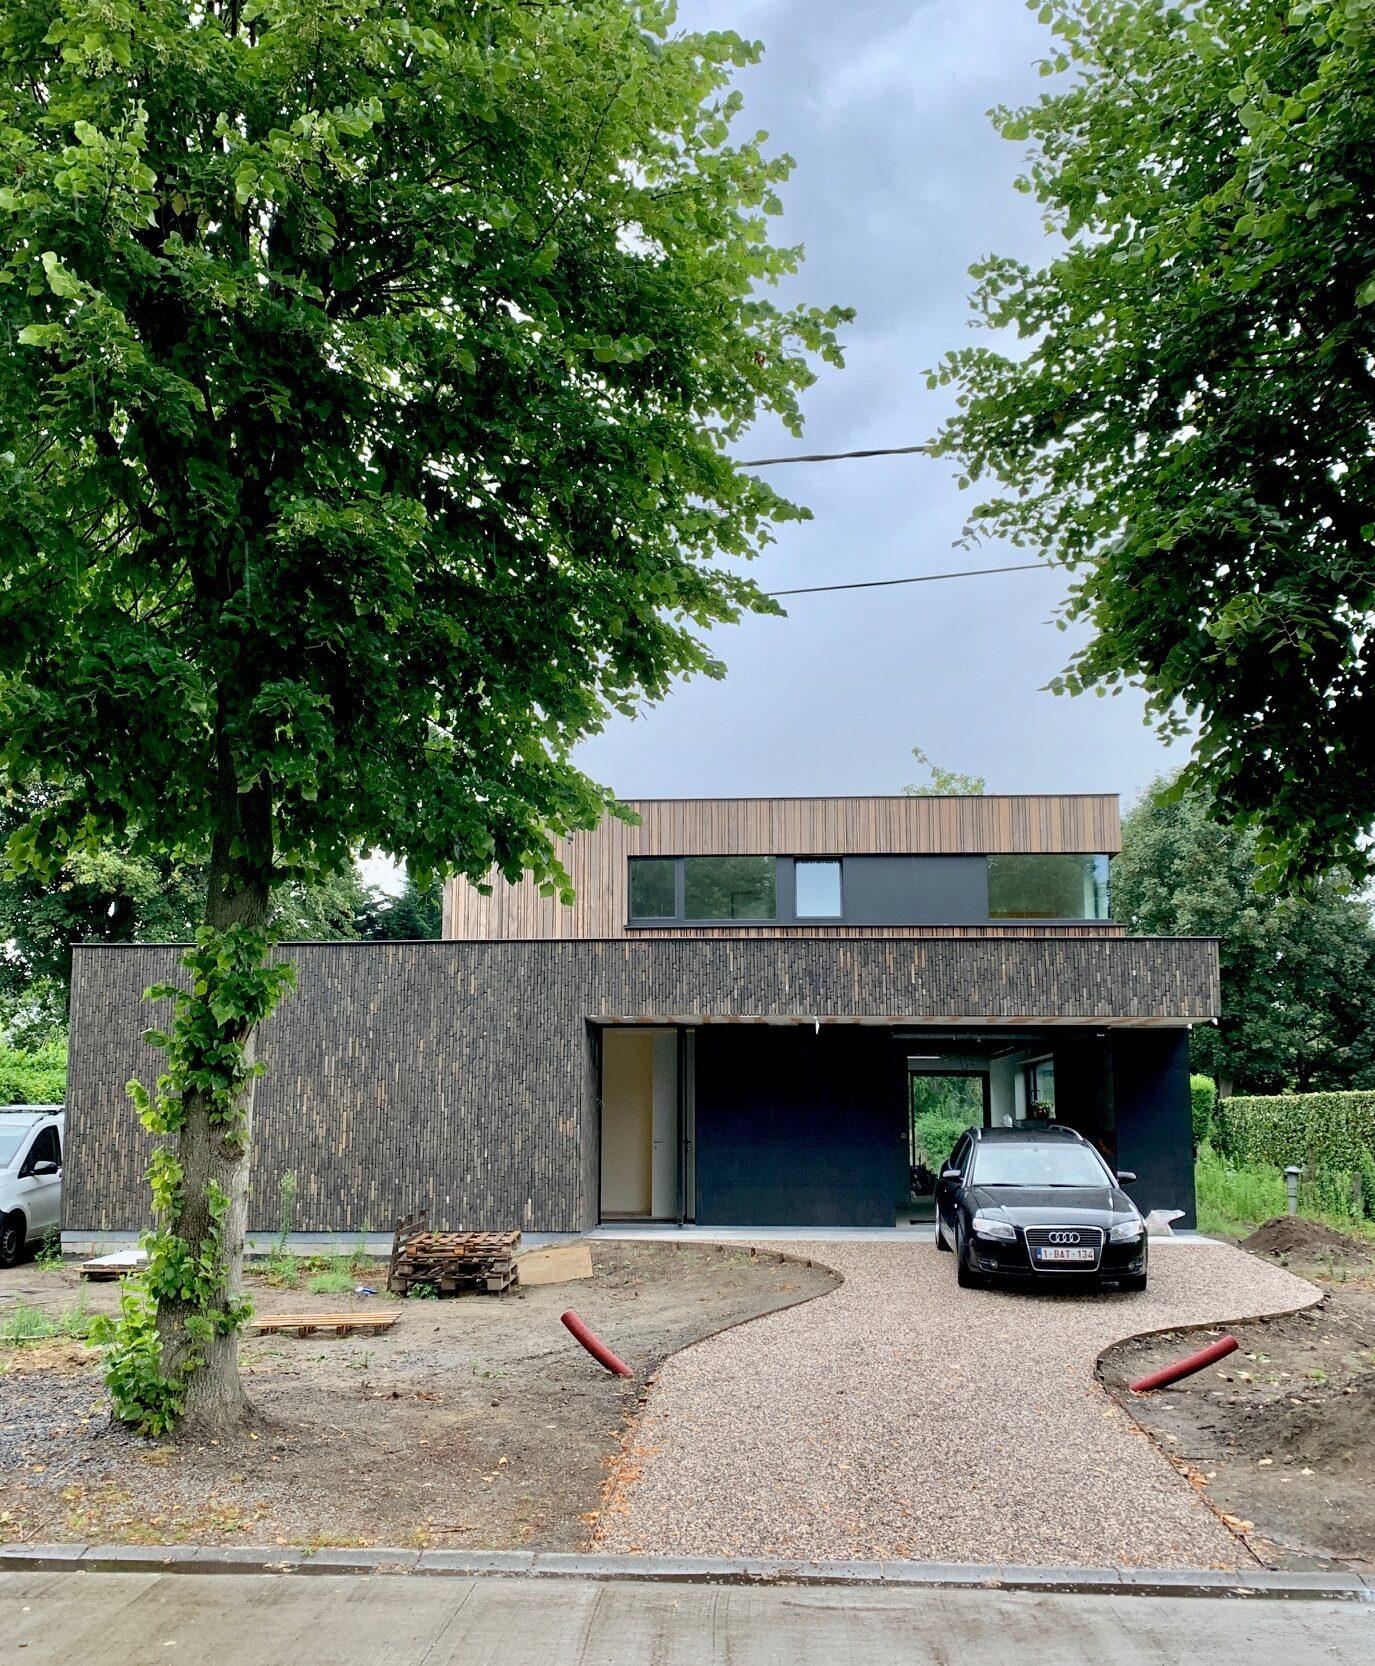 Unknown 2 e1609410983511 | Baeyens & Beck architecten Gent | architect nieuwbouw renovatie interieur | high end | architectenbureau